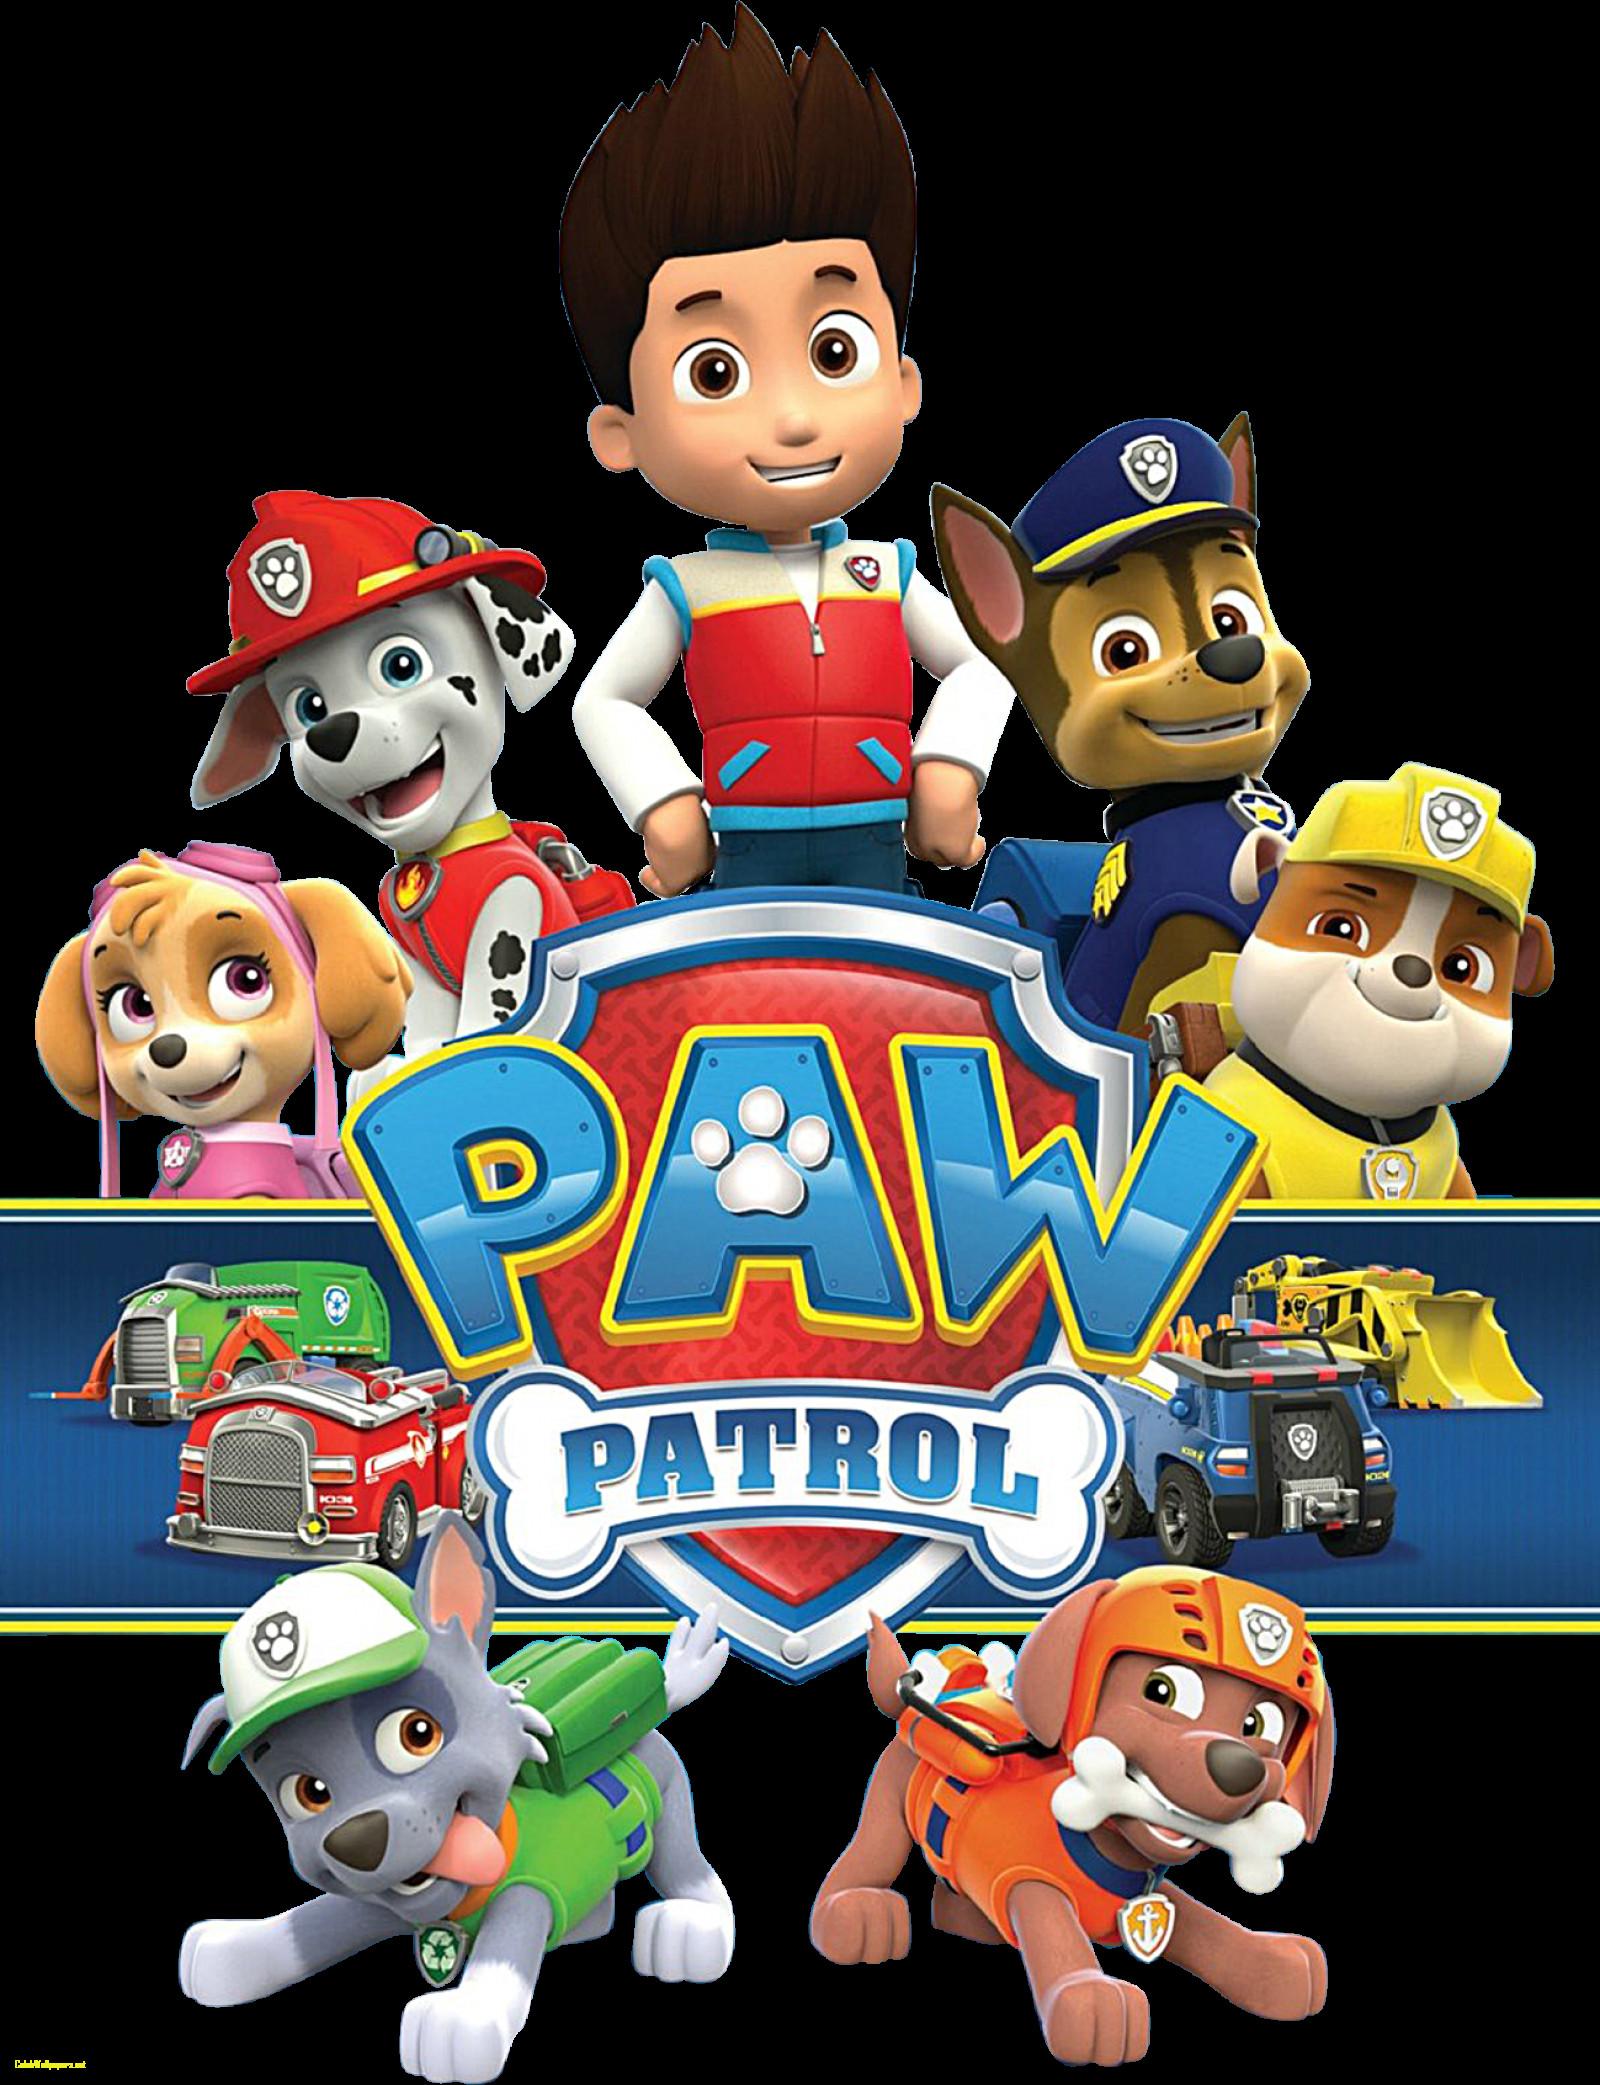 Paw Patrol Desktop Wallpaper Posted By John Cunningham